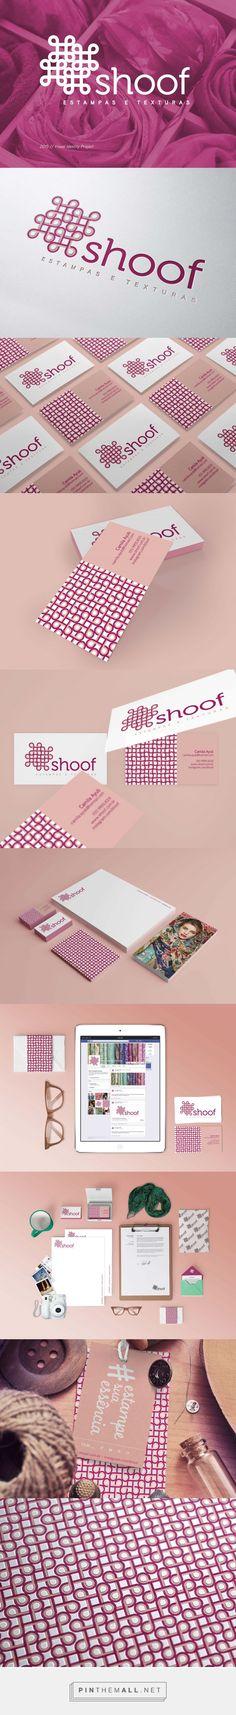 Shoof Branding by Joyce Kiesel on Behance | Fivestar Branding – Design and Branding Agency & Inspiration Gallery